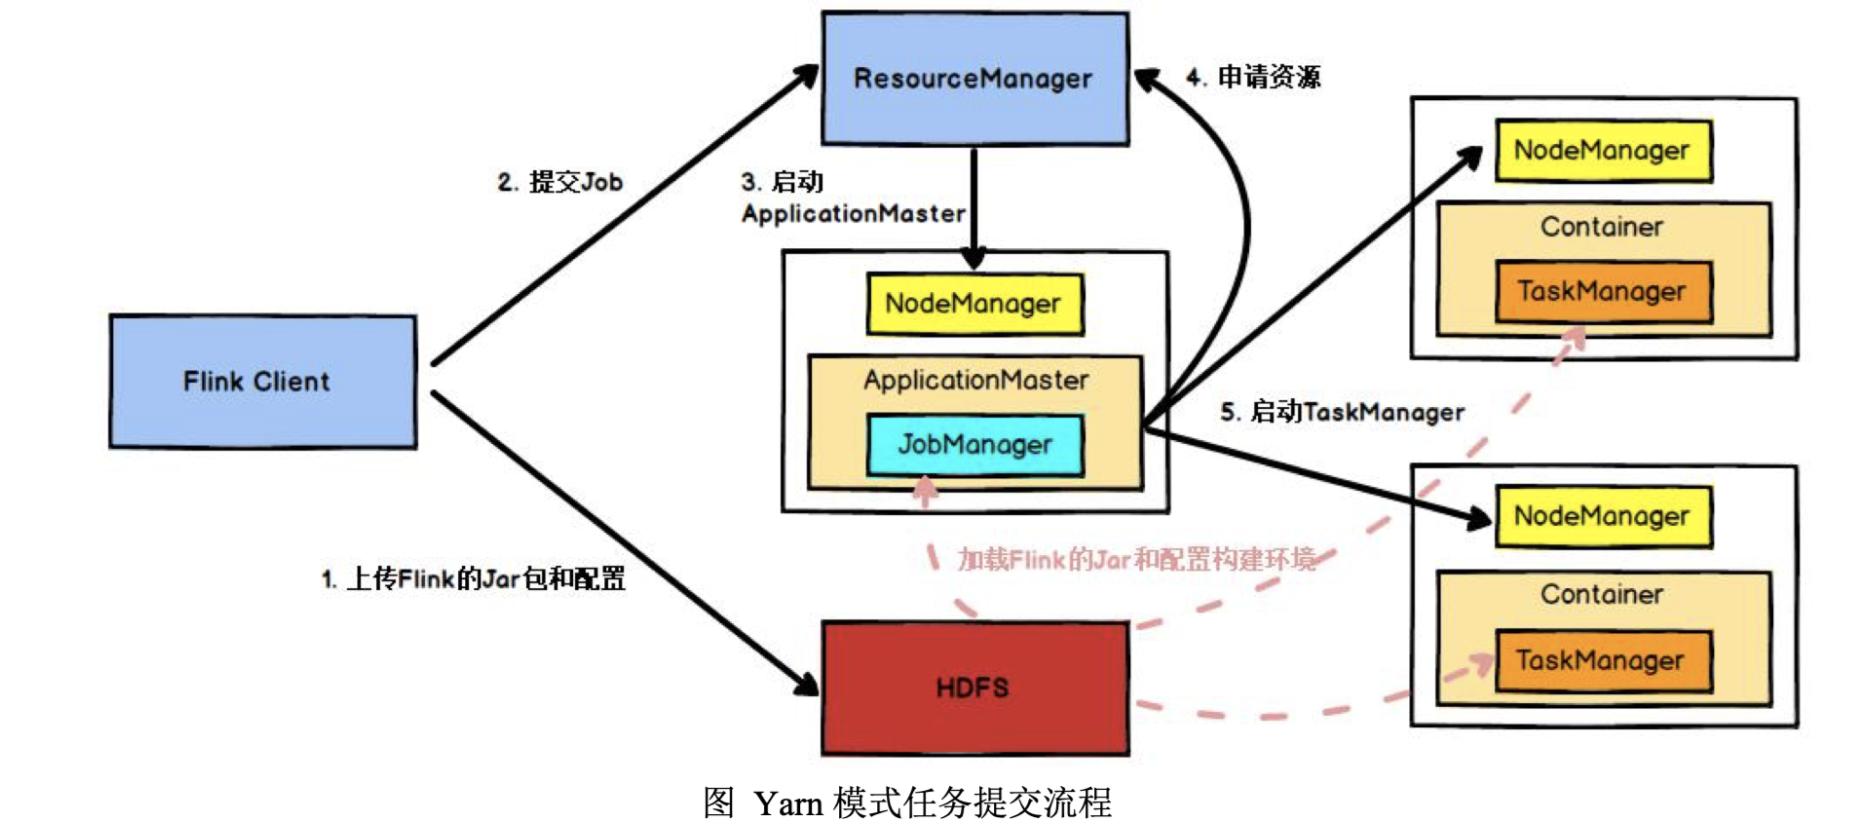 Flink运行时组件和基于Yarn的任务提交